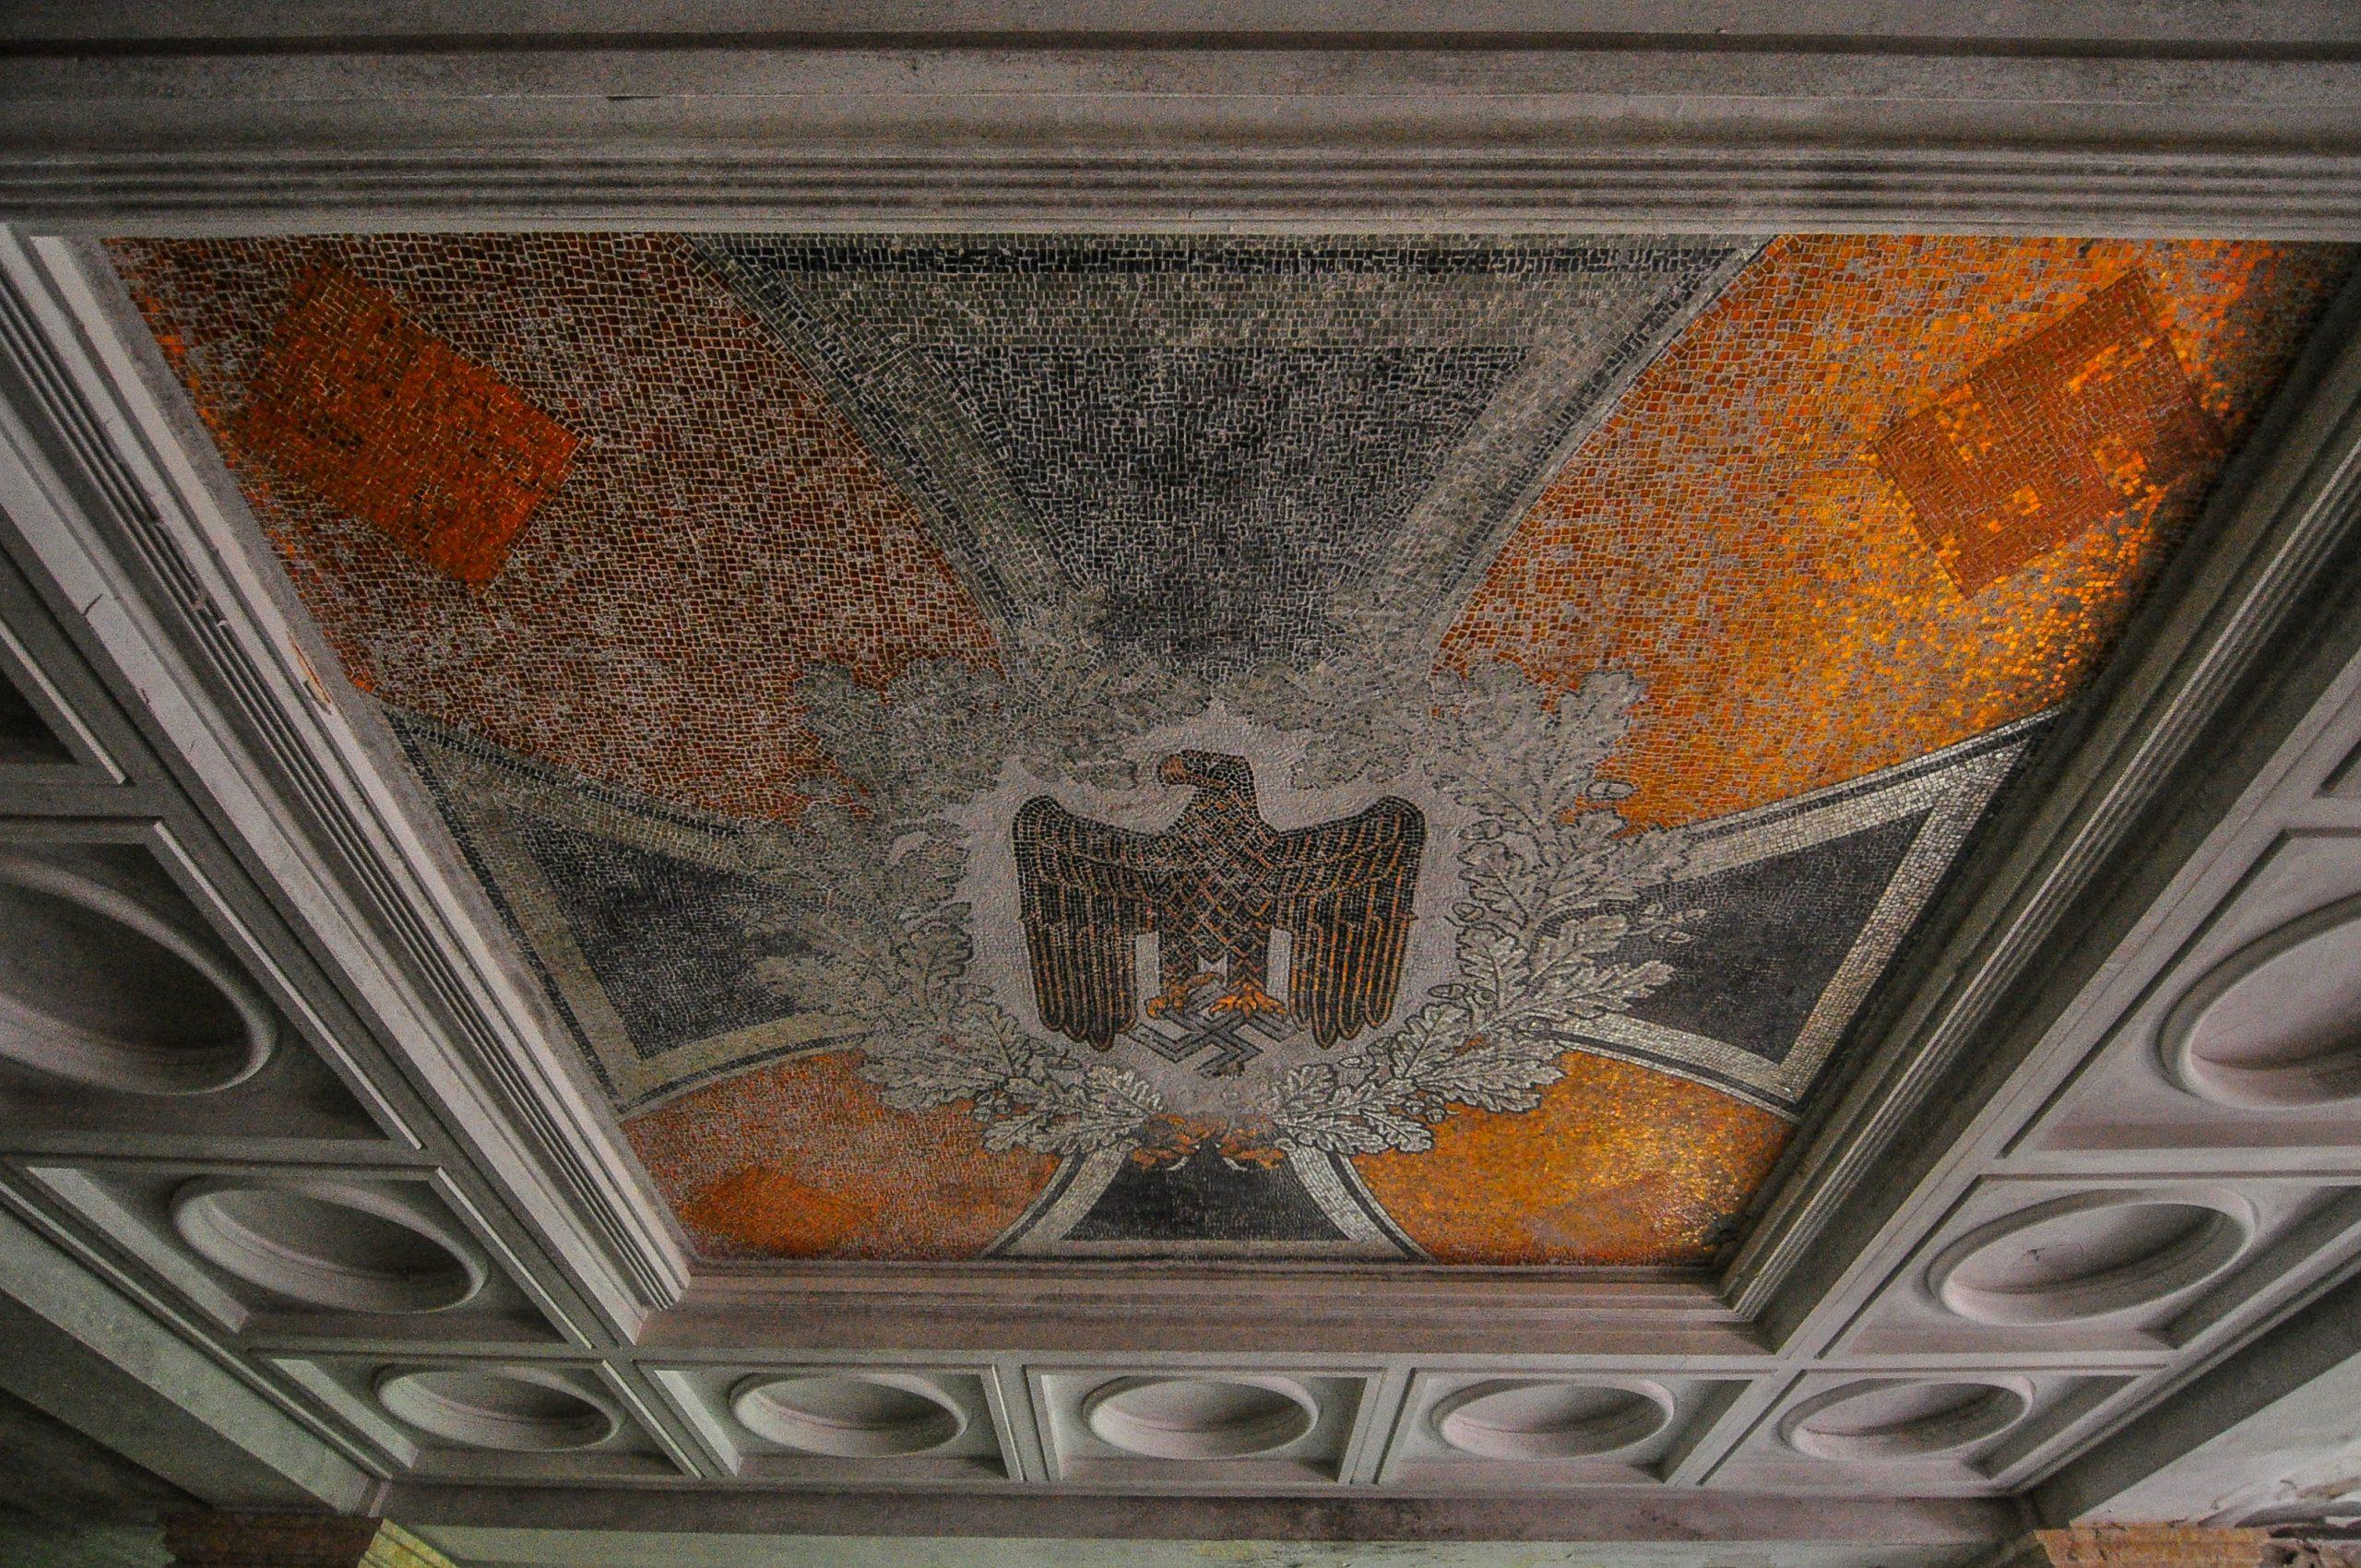 nazi eagle mosaic swastika tiles kaserne krampnitz abandoned potsdam berlin Kavallerieschule barracks Panzertruppenschule nazi soviet military base germany deutschland